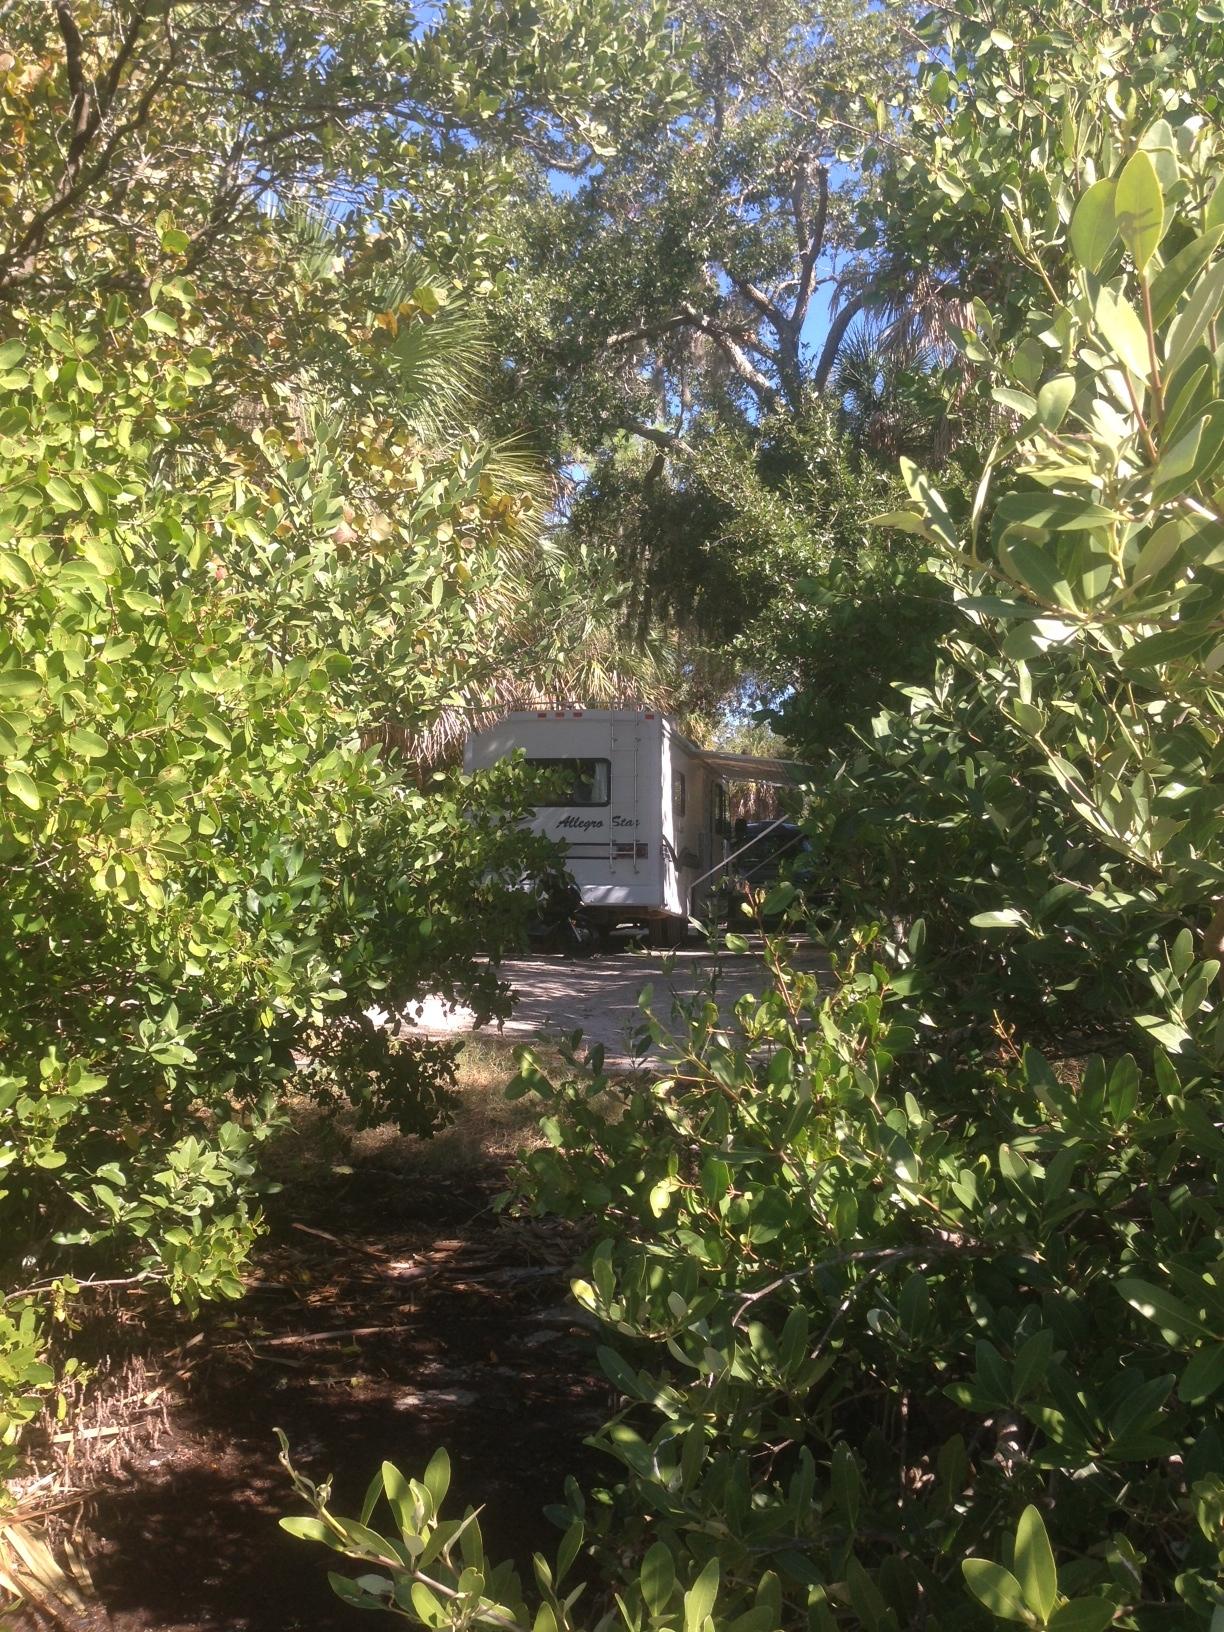 Camping At Fort Desoto Park St Petersburg Florida How